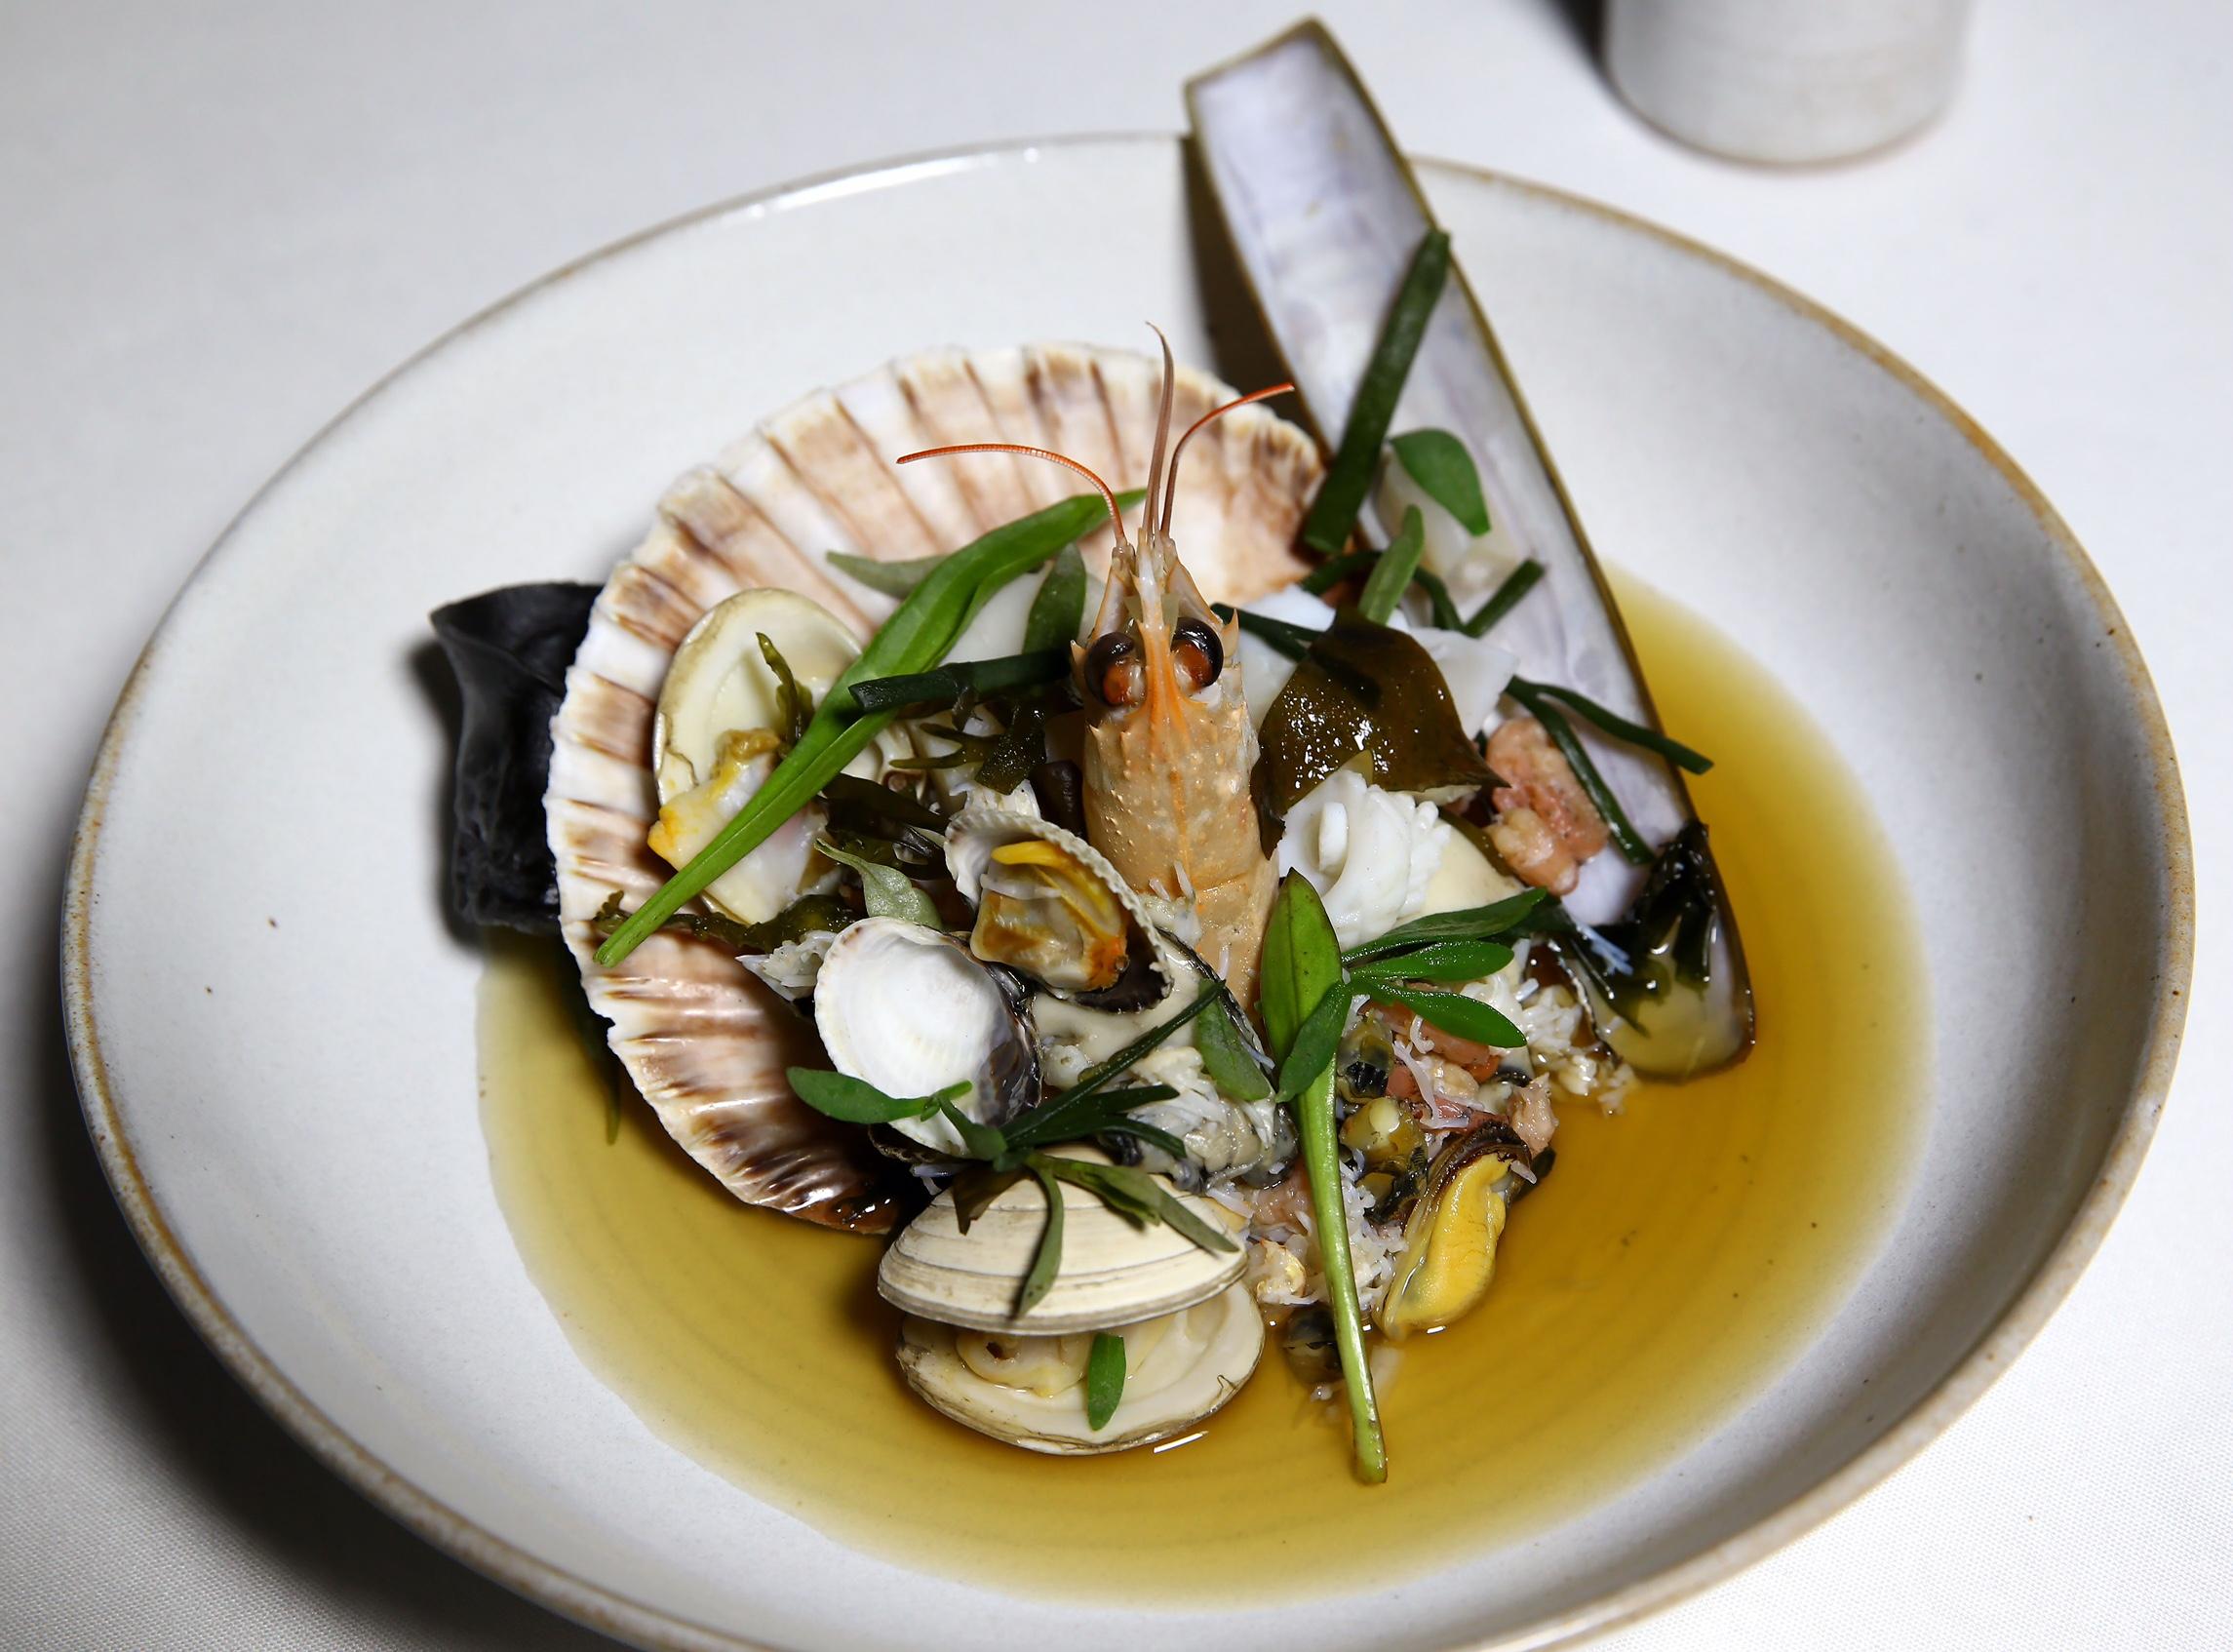 tom kitchins fish and shellfish